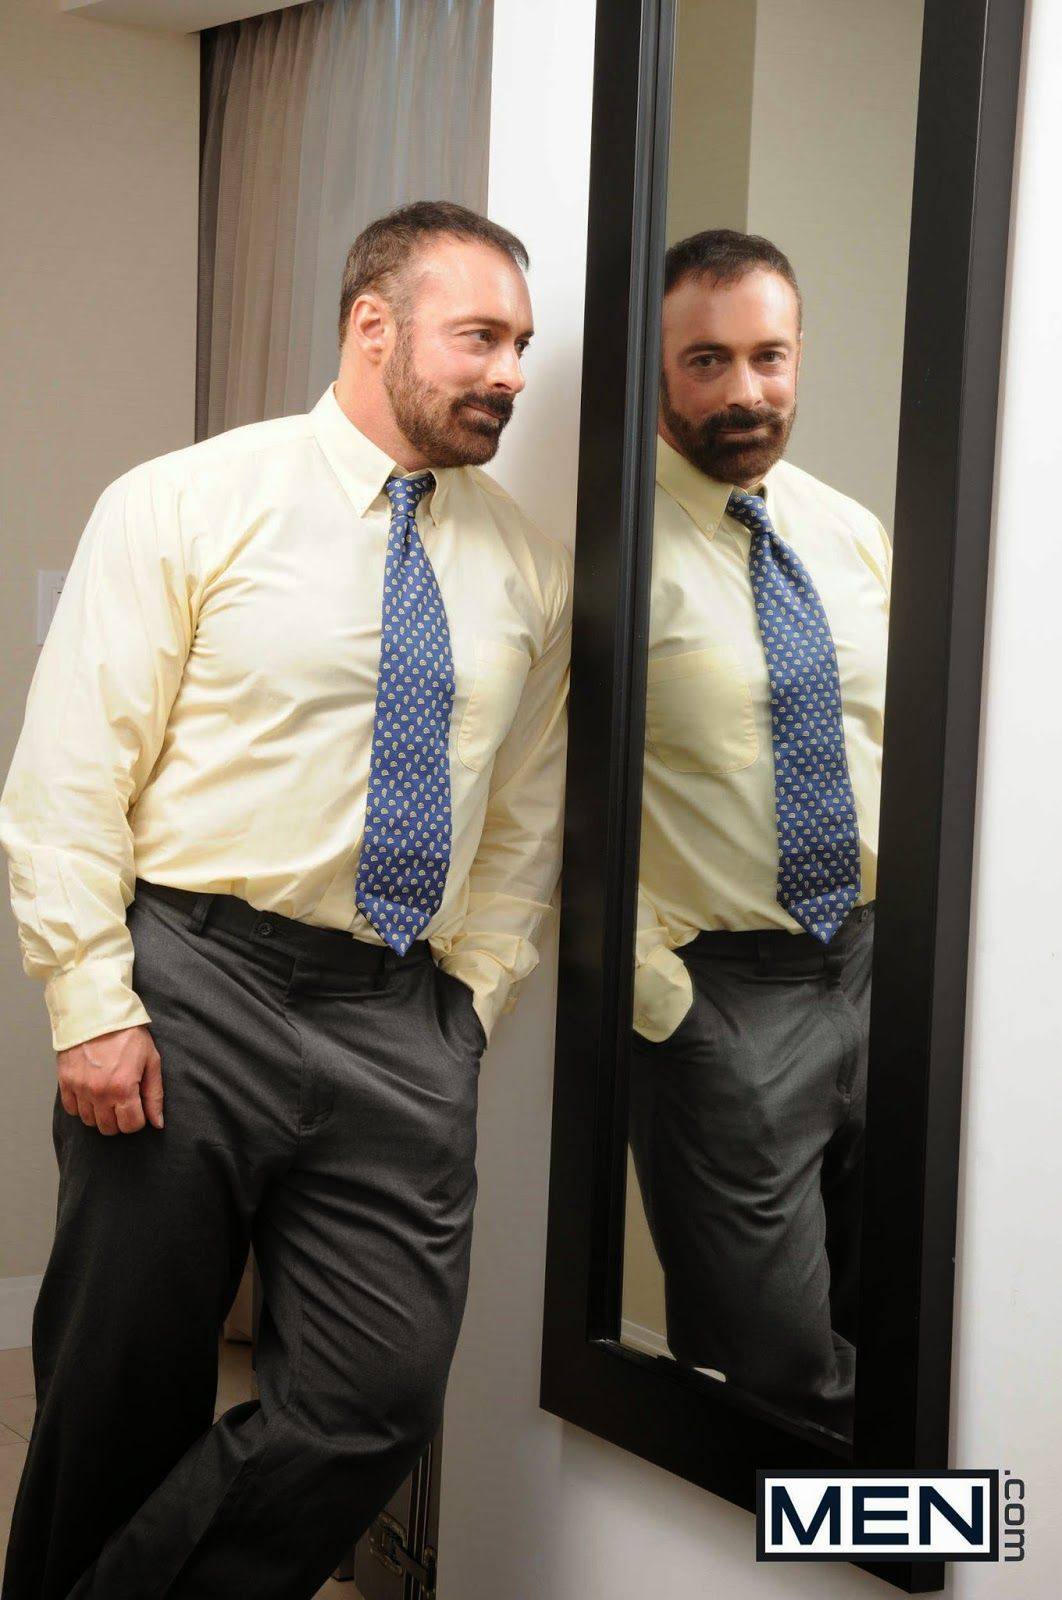 Actor Porno Calbo brad calvo suits in mirror | muscle bear men, beard suit